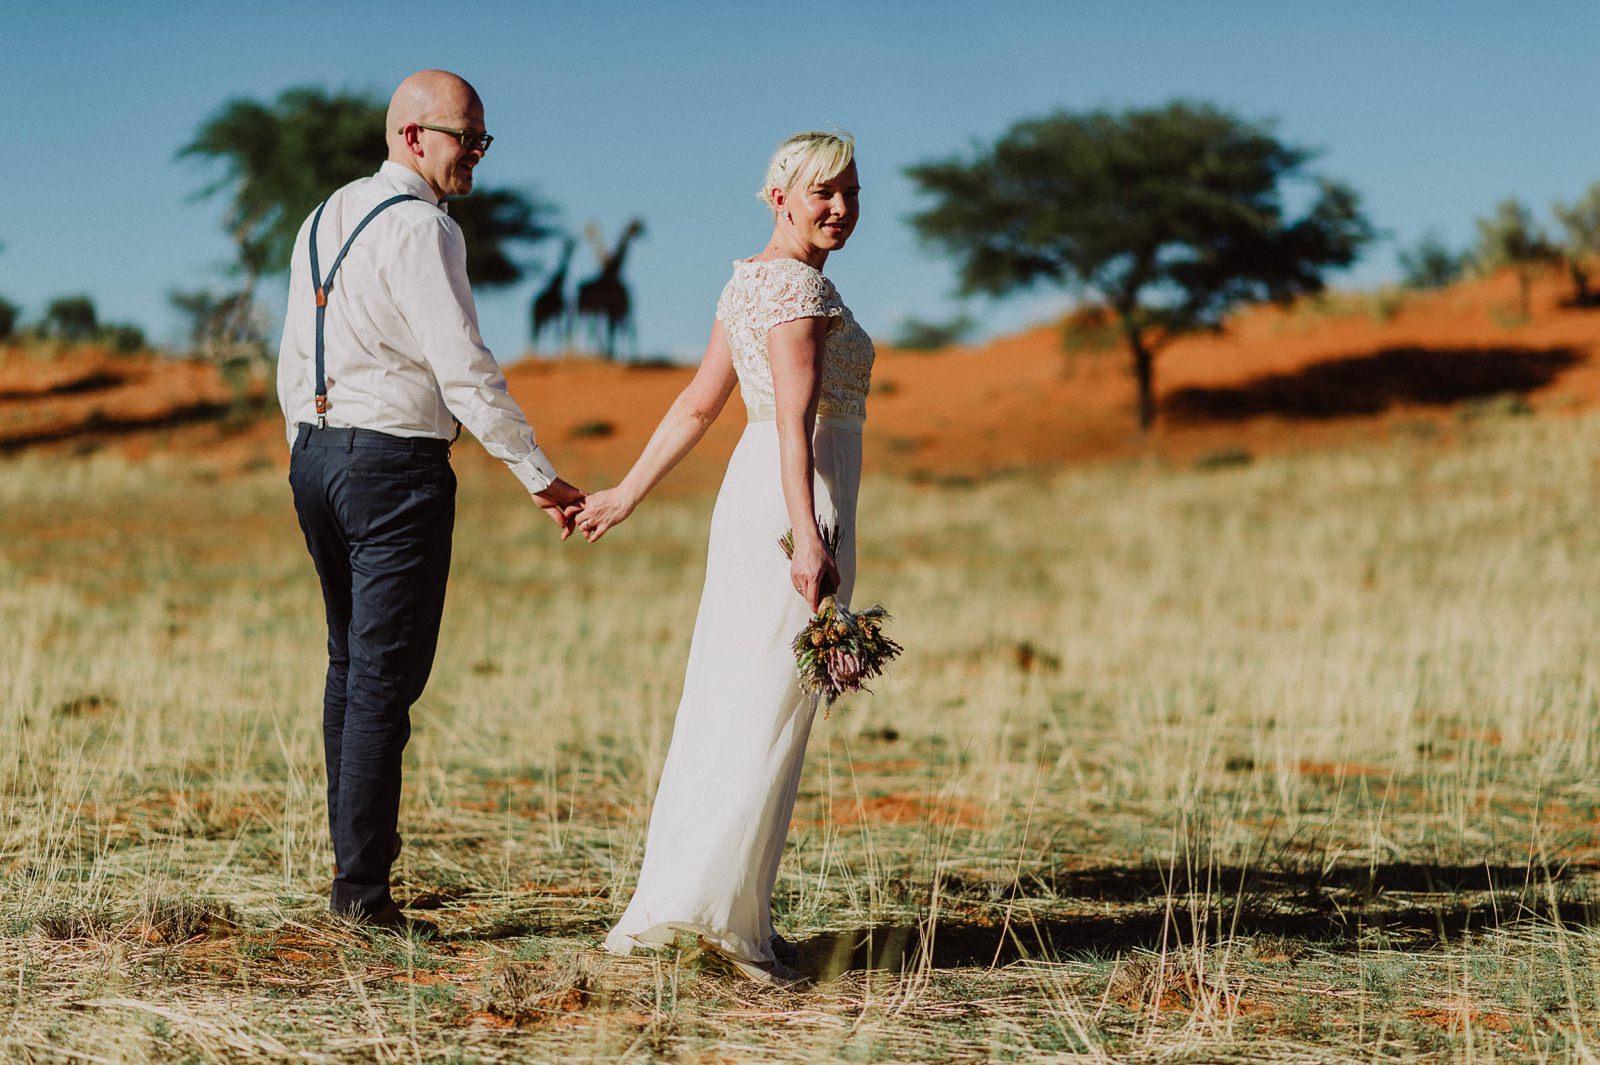 heiraten-in-namibia-7684.jpg